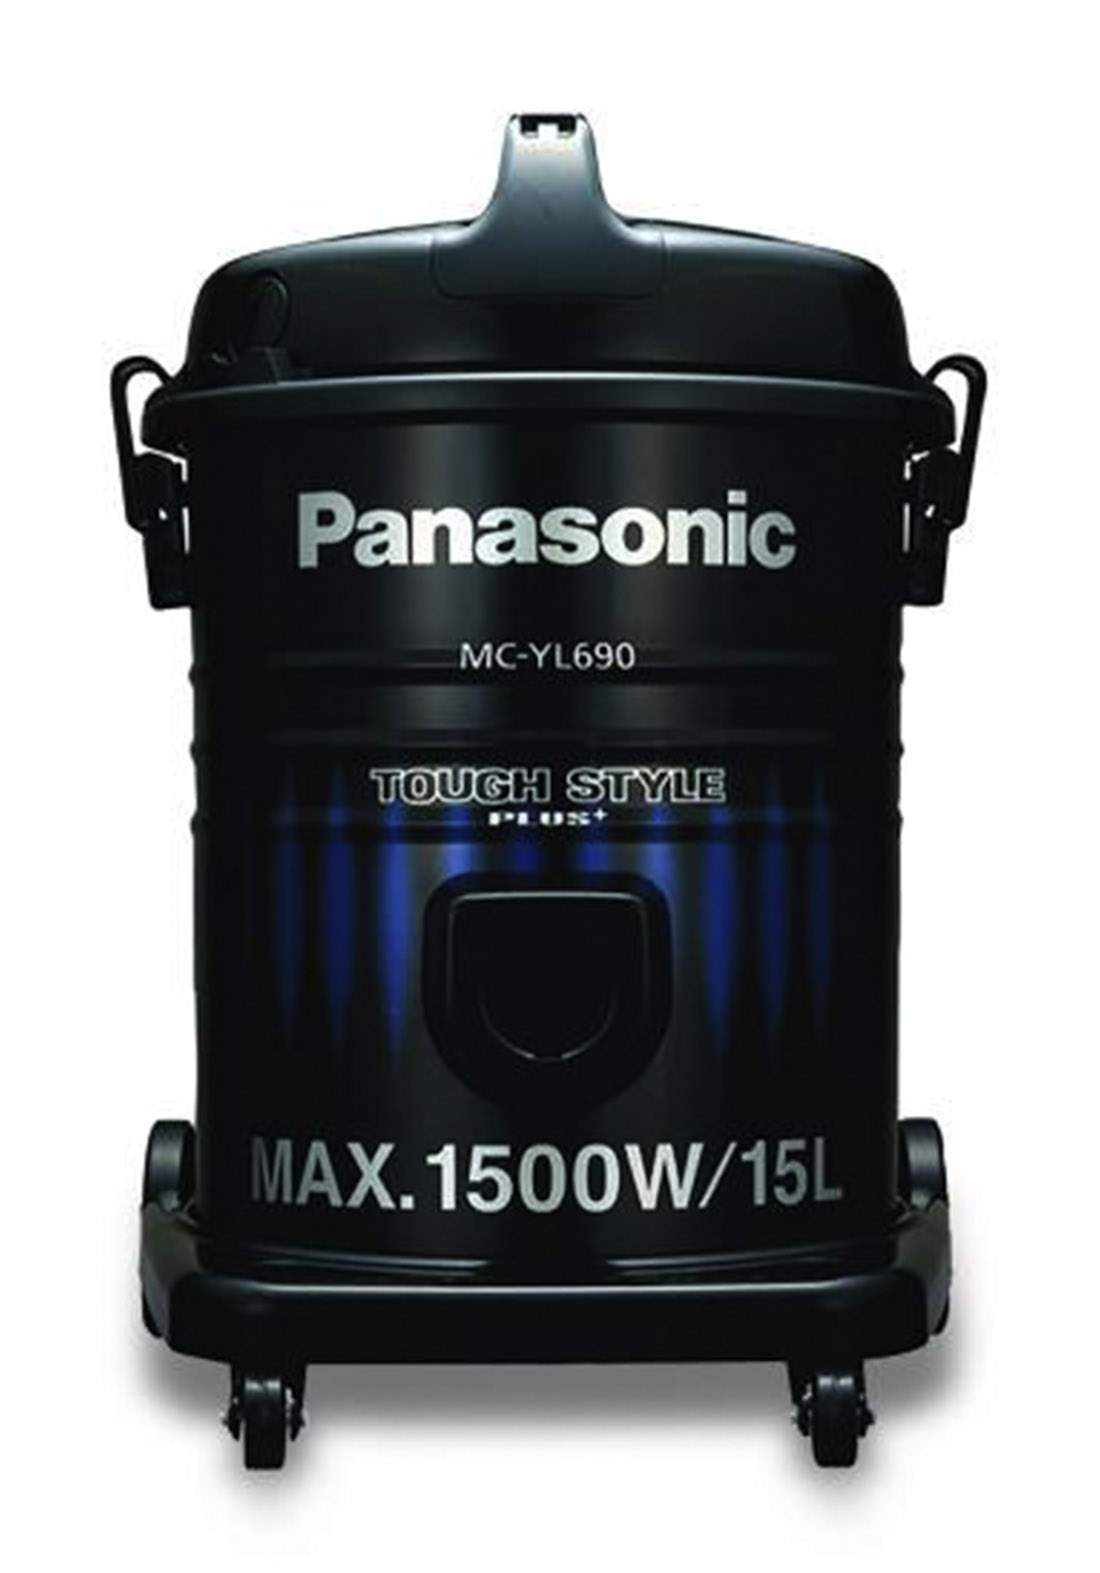 Panasonic (MC-YL690AH49) 15 Liters 1500w Vacum Cleaner مكنسة كهربائية